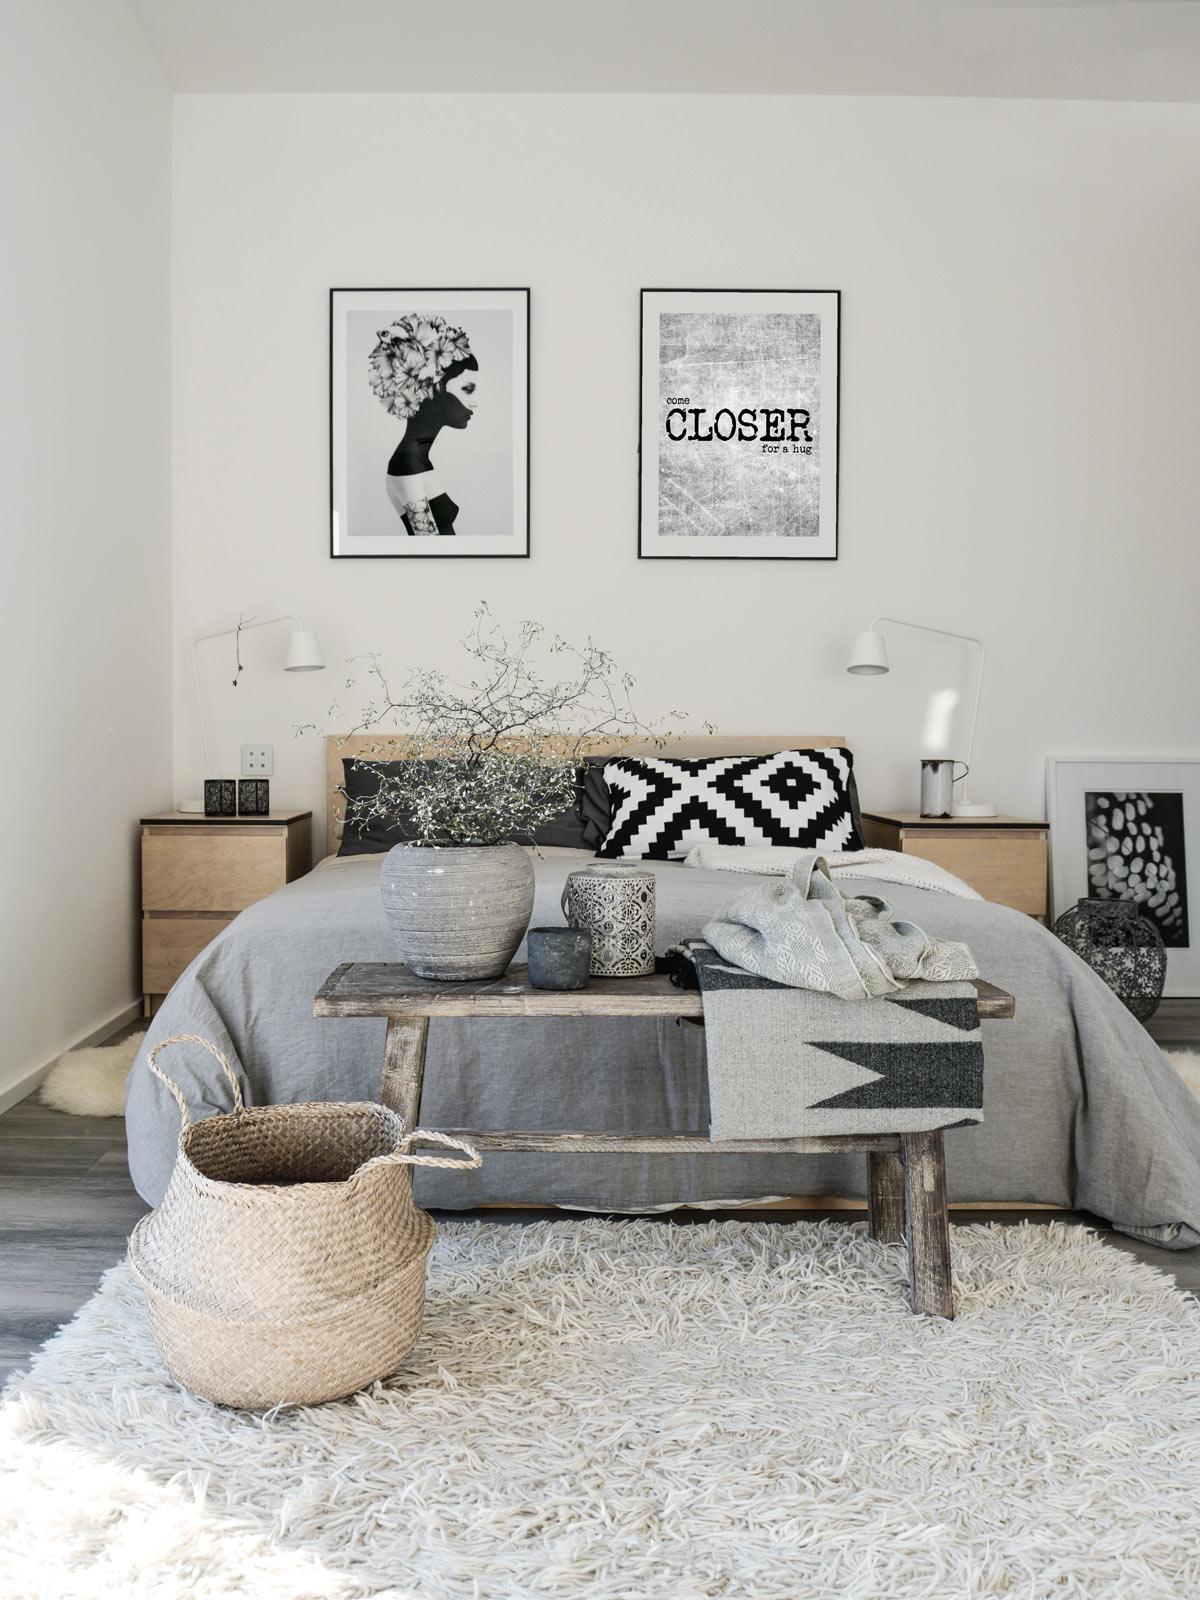 clem around the corner chambre scandicraft banc bois panier rangement osier tapis peluche blanche déco tendance